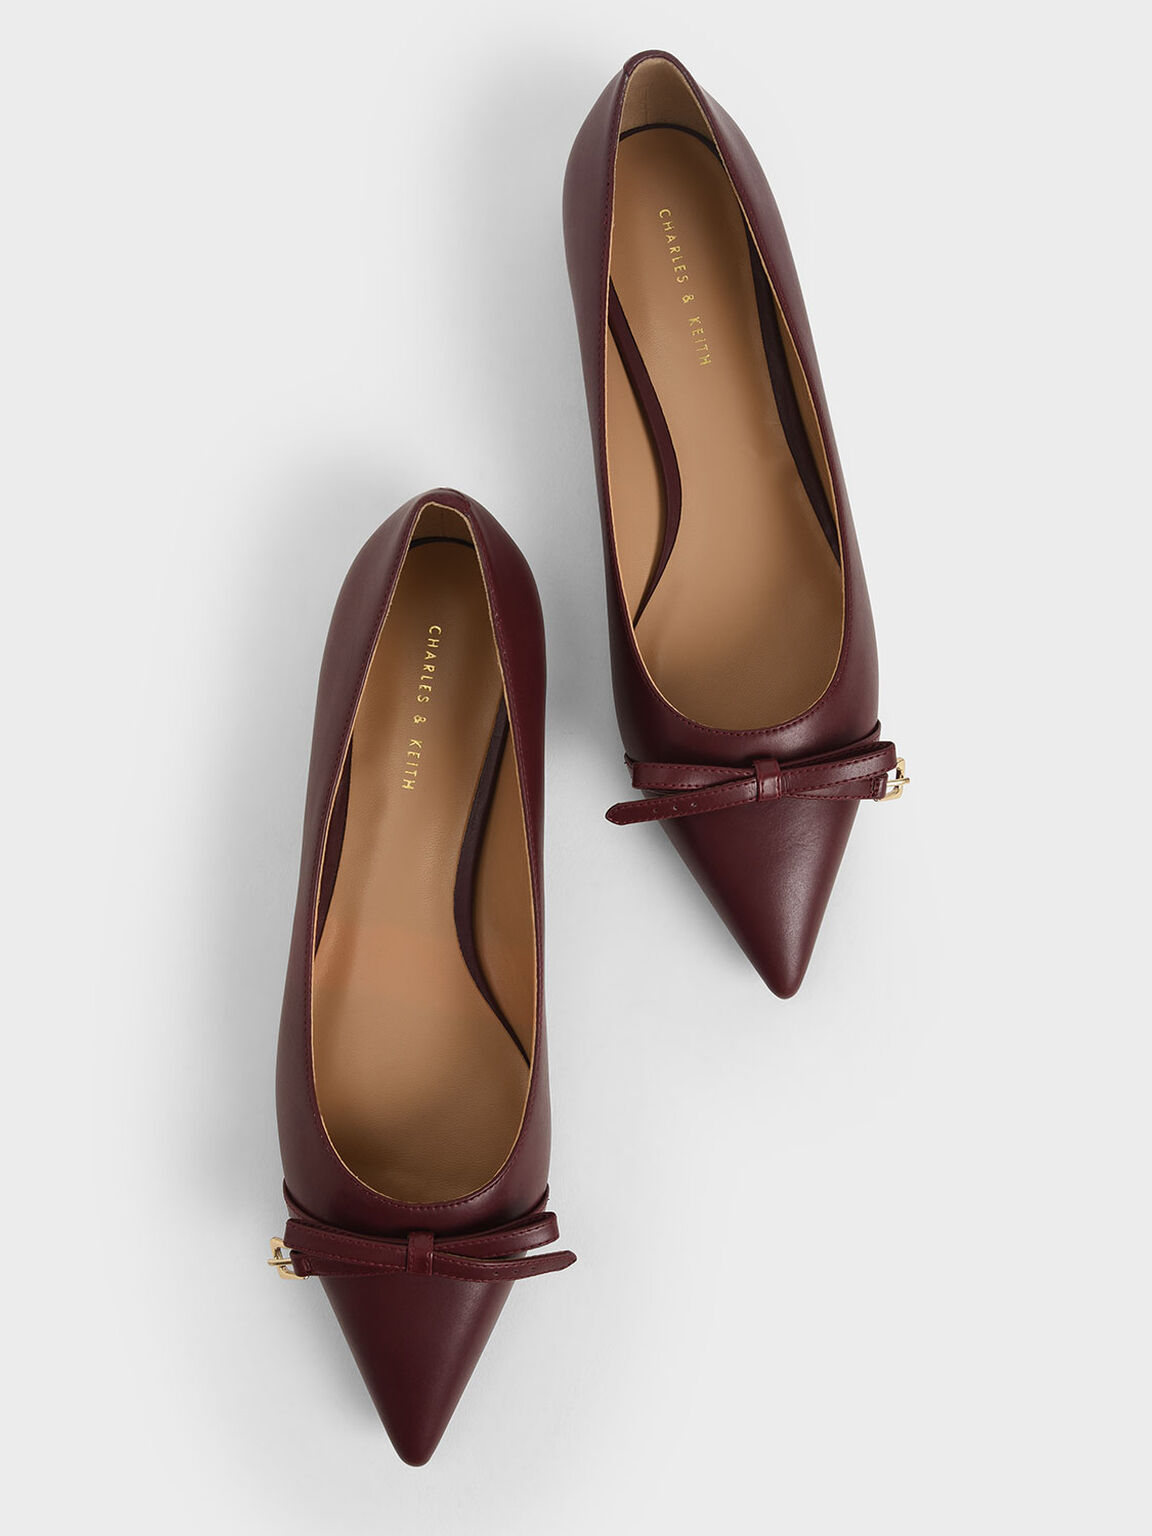 Bow Ballerina Flats, Maroon, hi-res